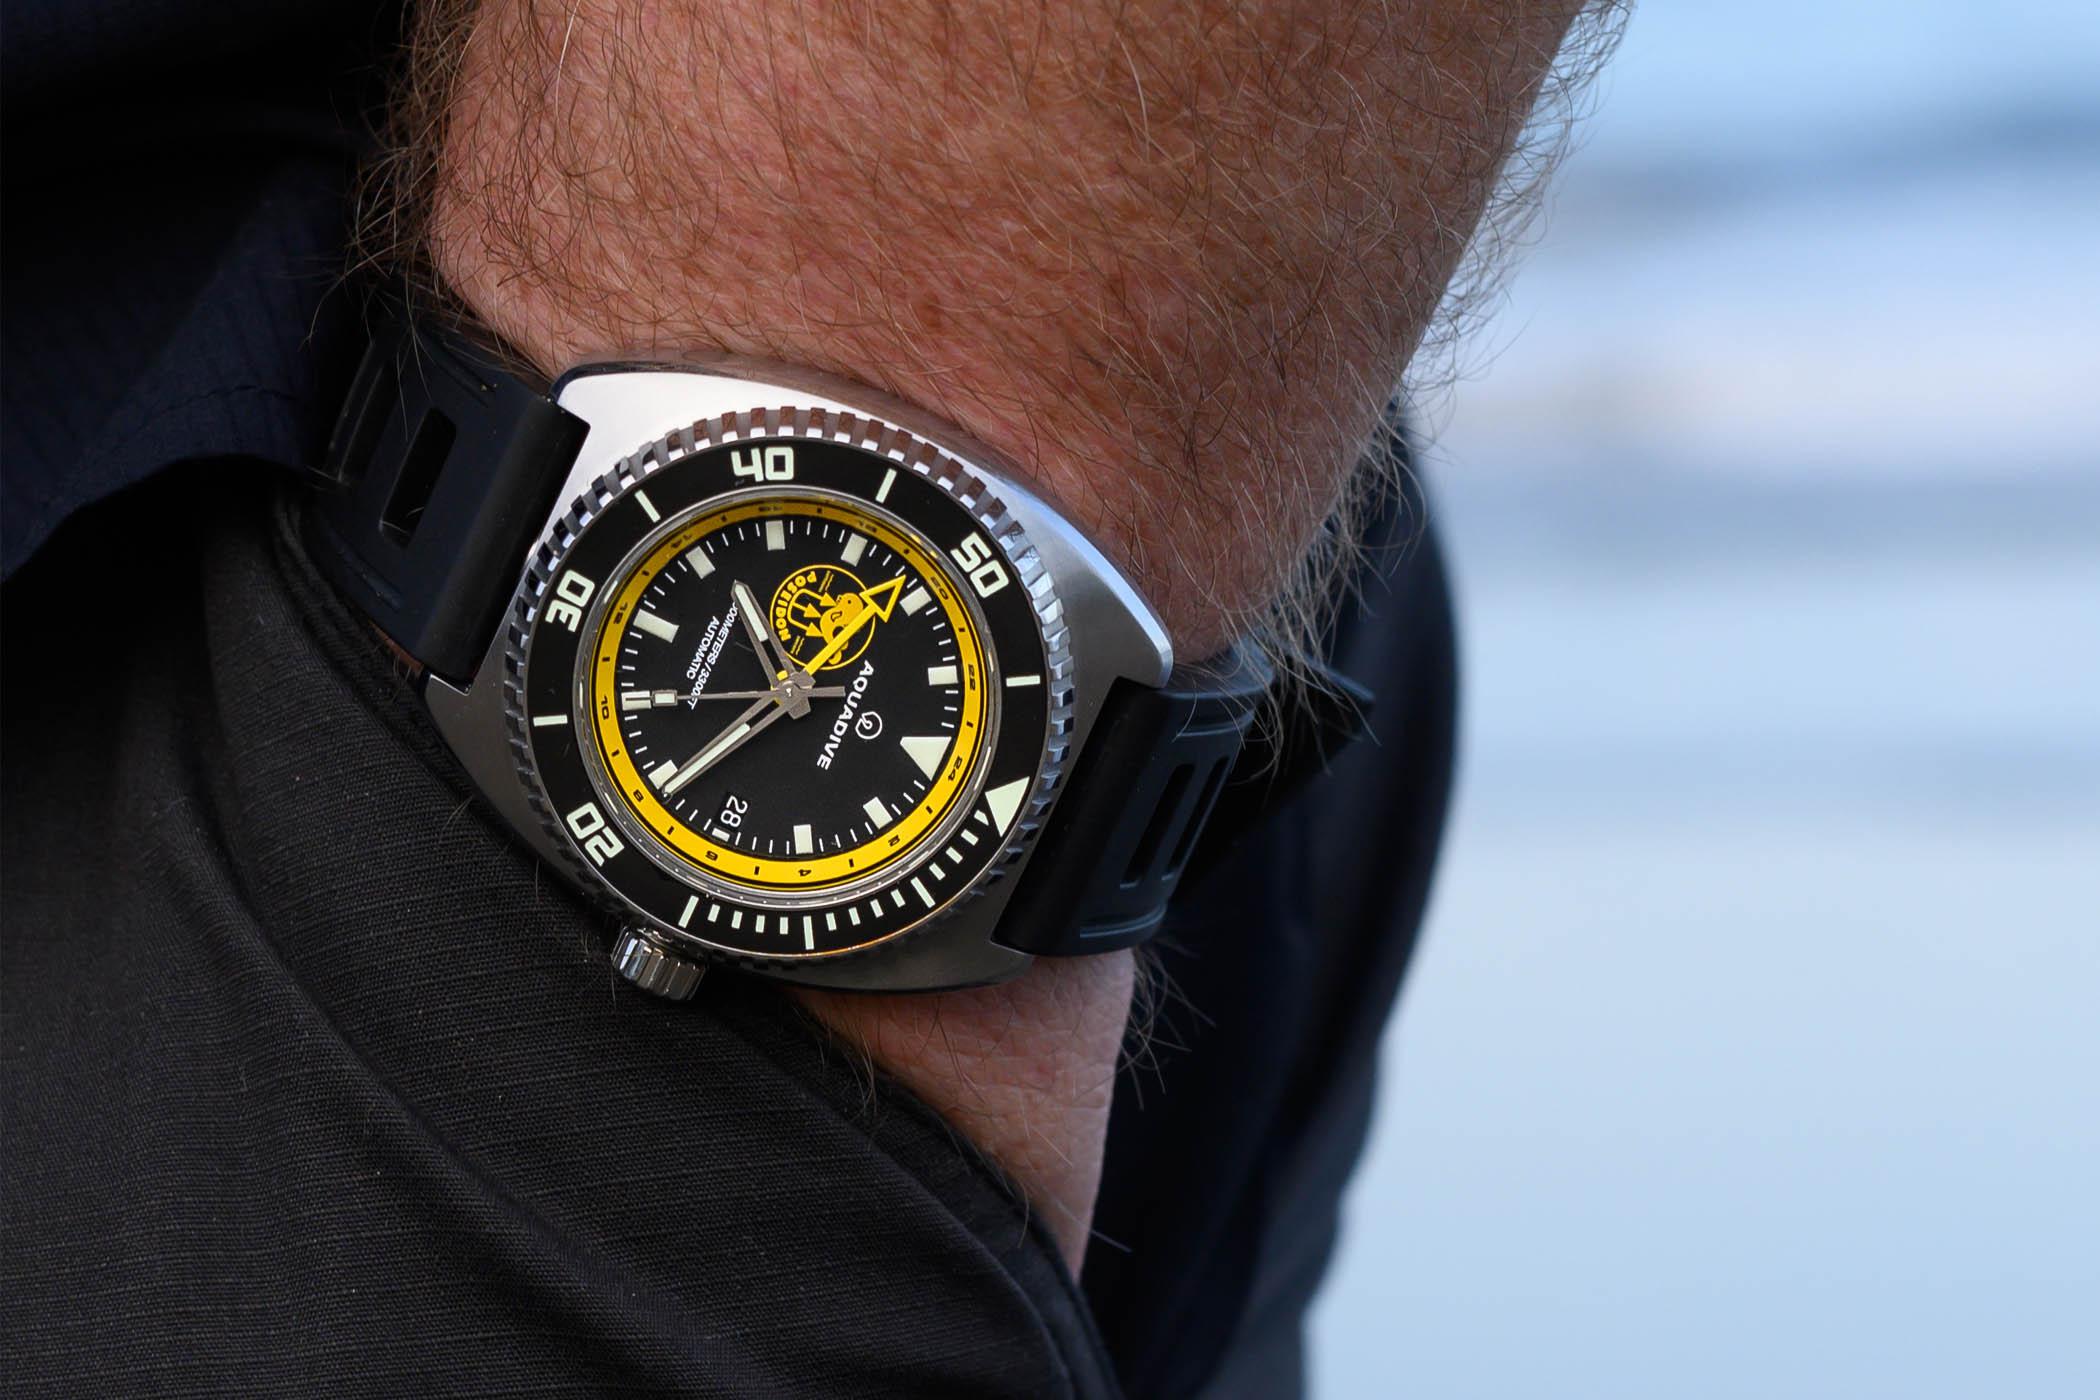 Aquadive Bathyscaphe 100 GMT Poseidon Edition